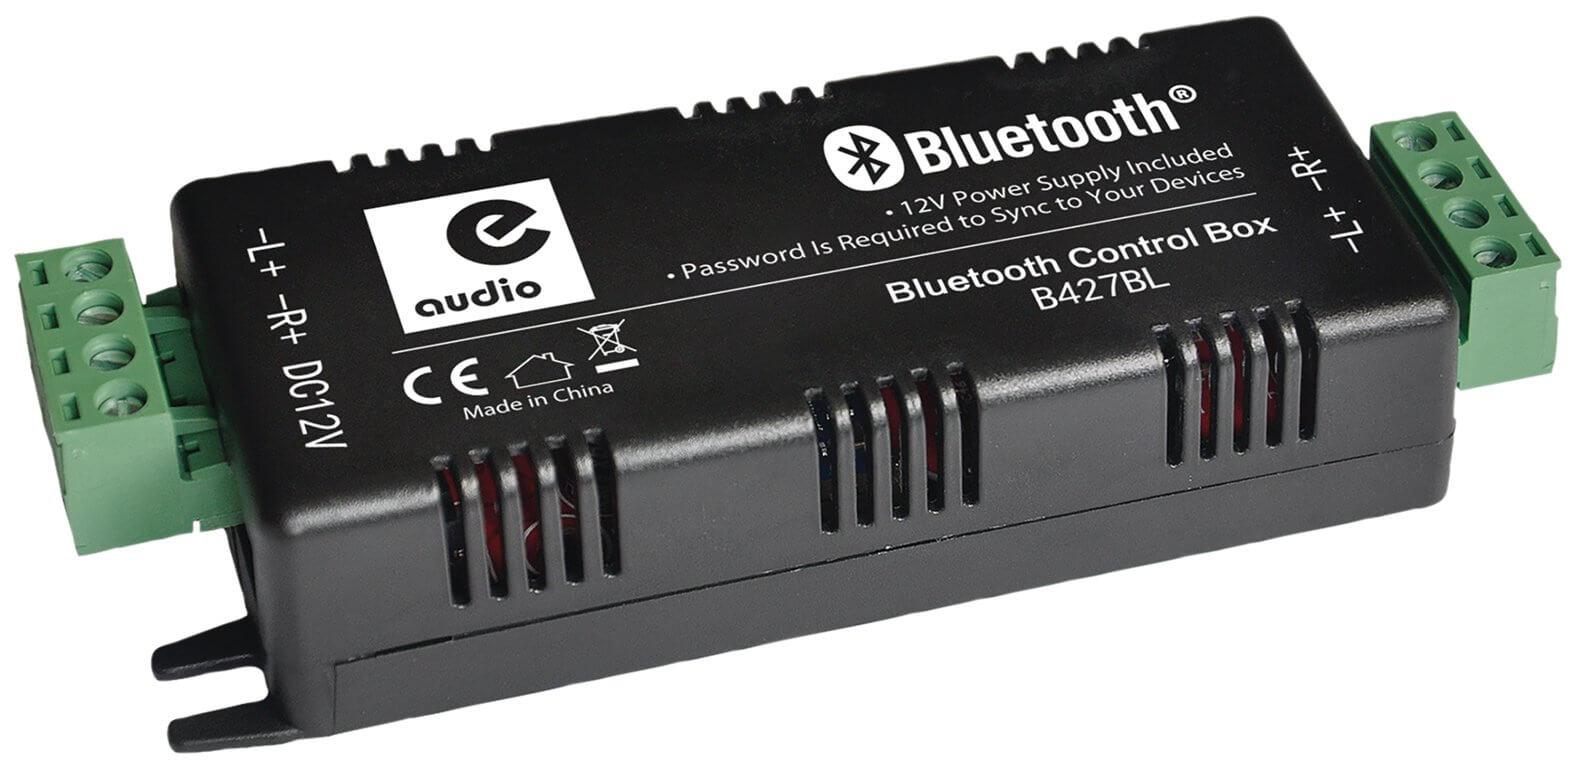 e-audio Bluetooth 4.0 Stereo Audio Amplifier 4 x 15W